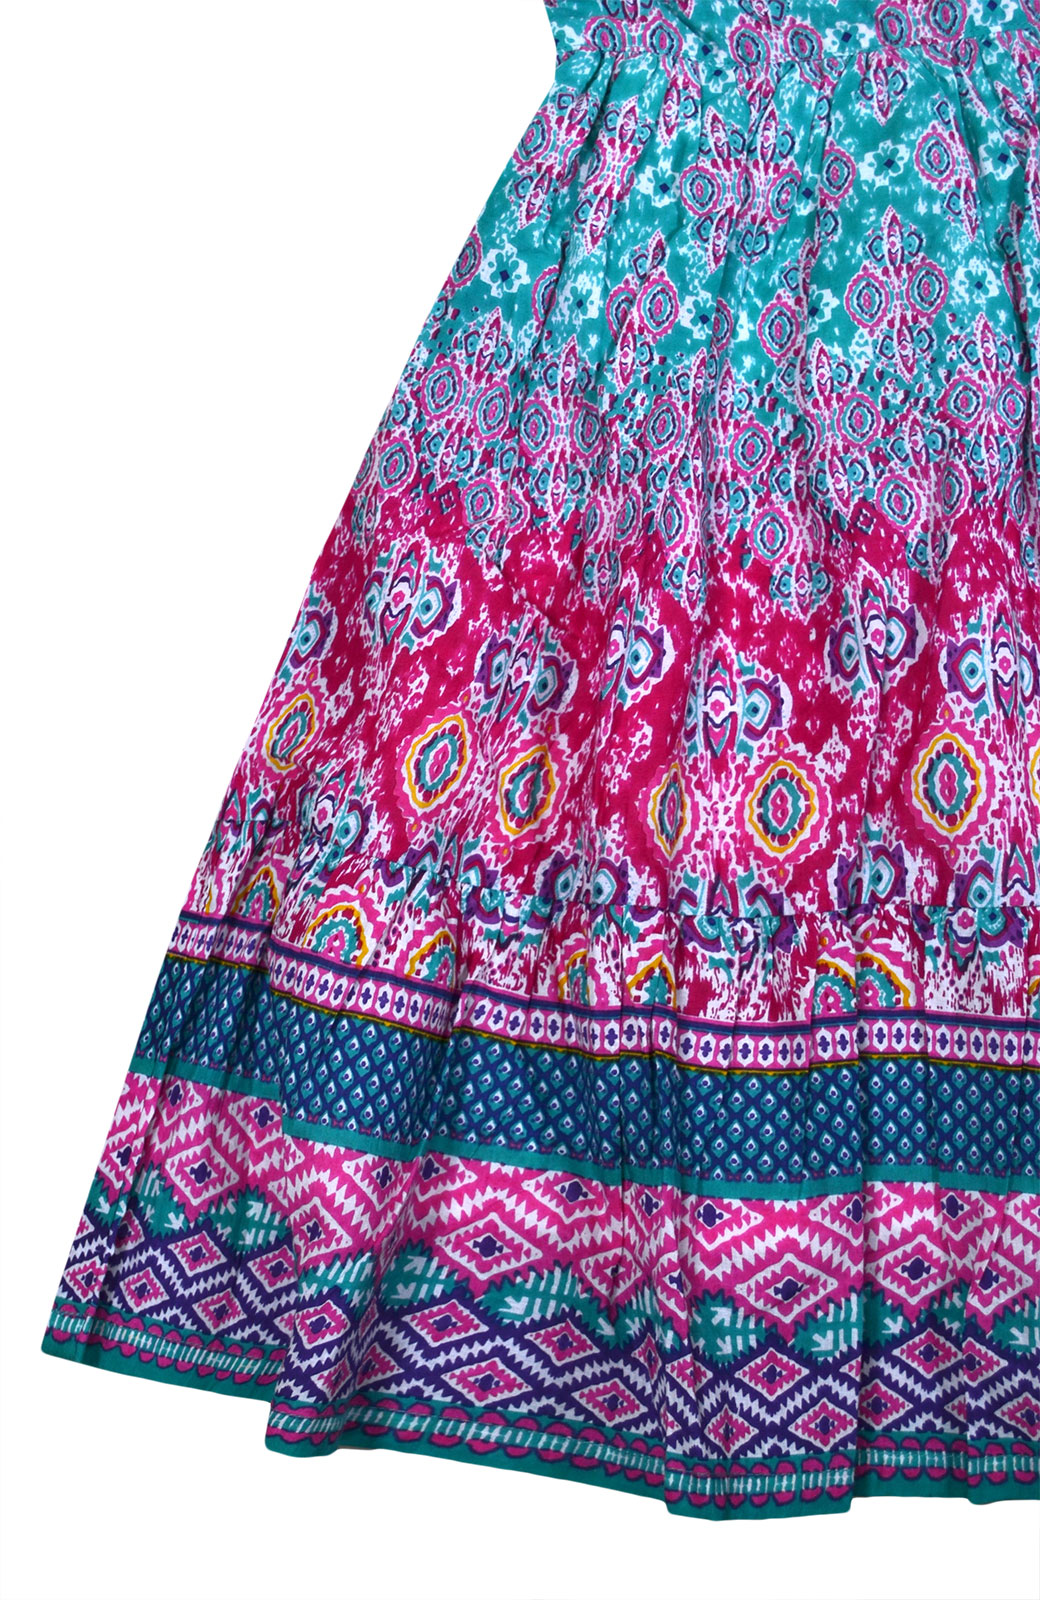 Girls Summer Dress Kids Aztec Gypsy Print Dresses Age 3 4 5 6 7 8 9 10 11 Years